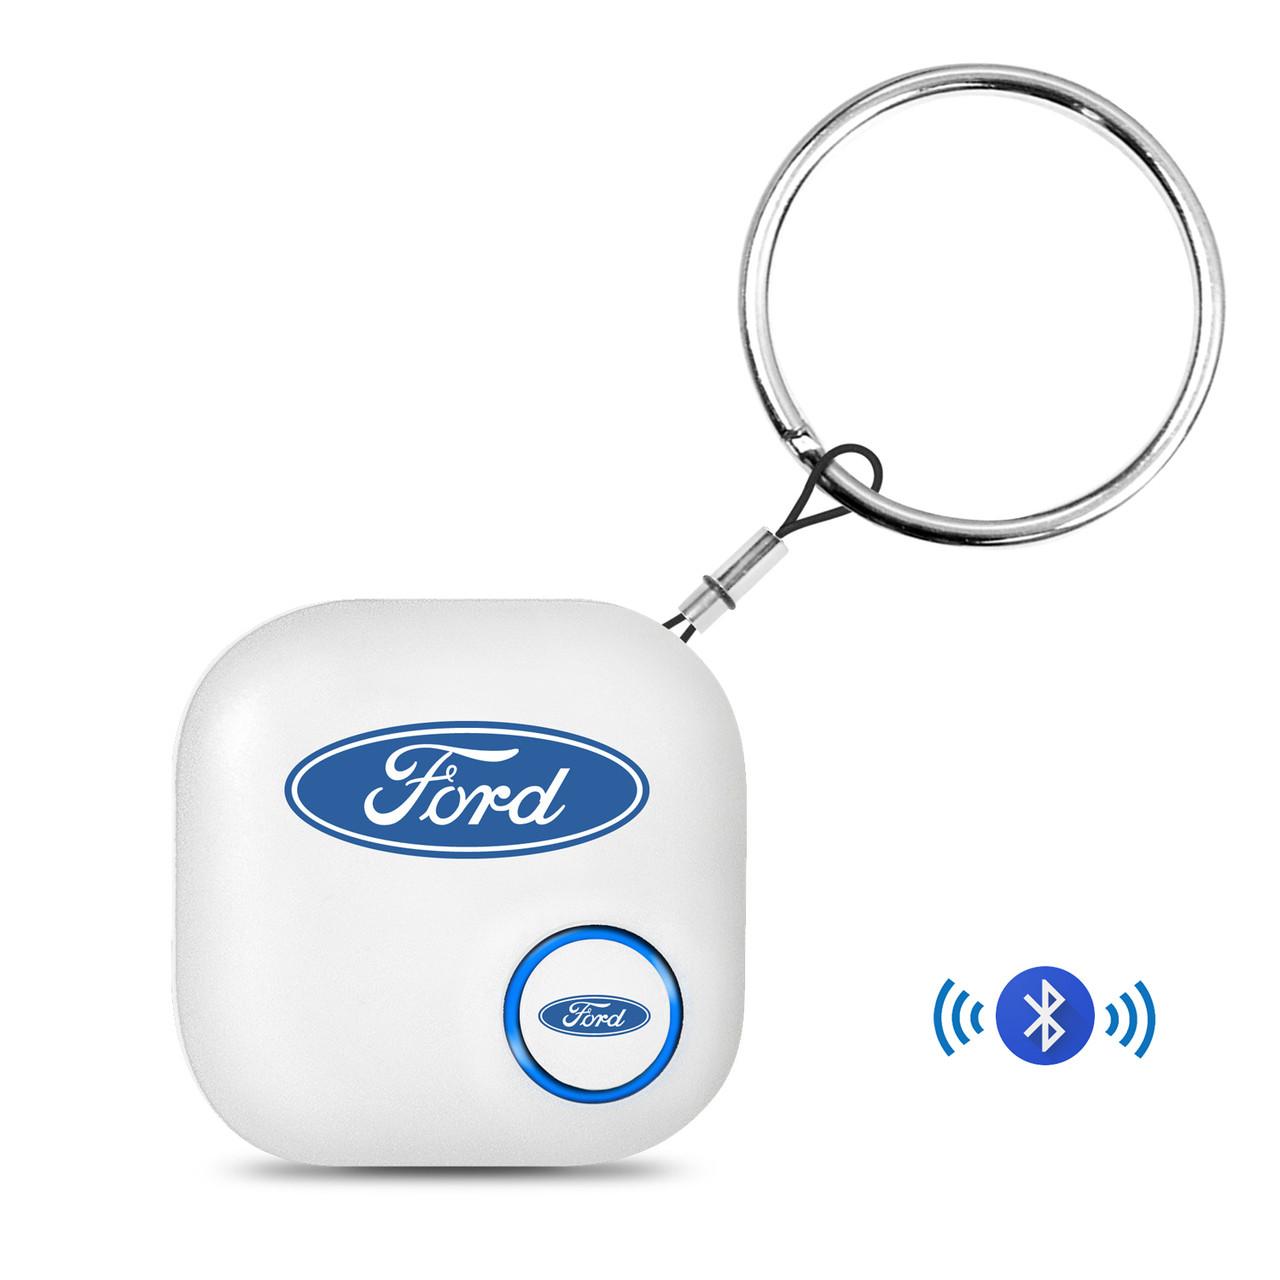 Ford Logo Bluetooth Smart Key Finder Key Chain Car Beyond Store